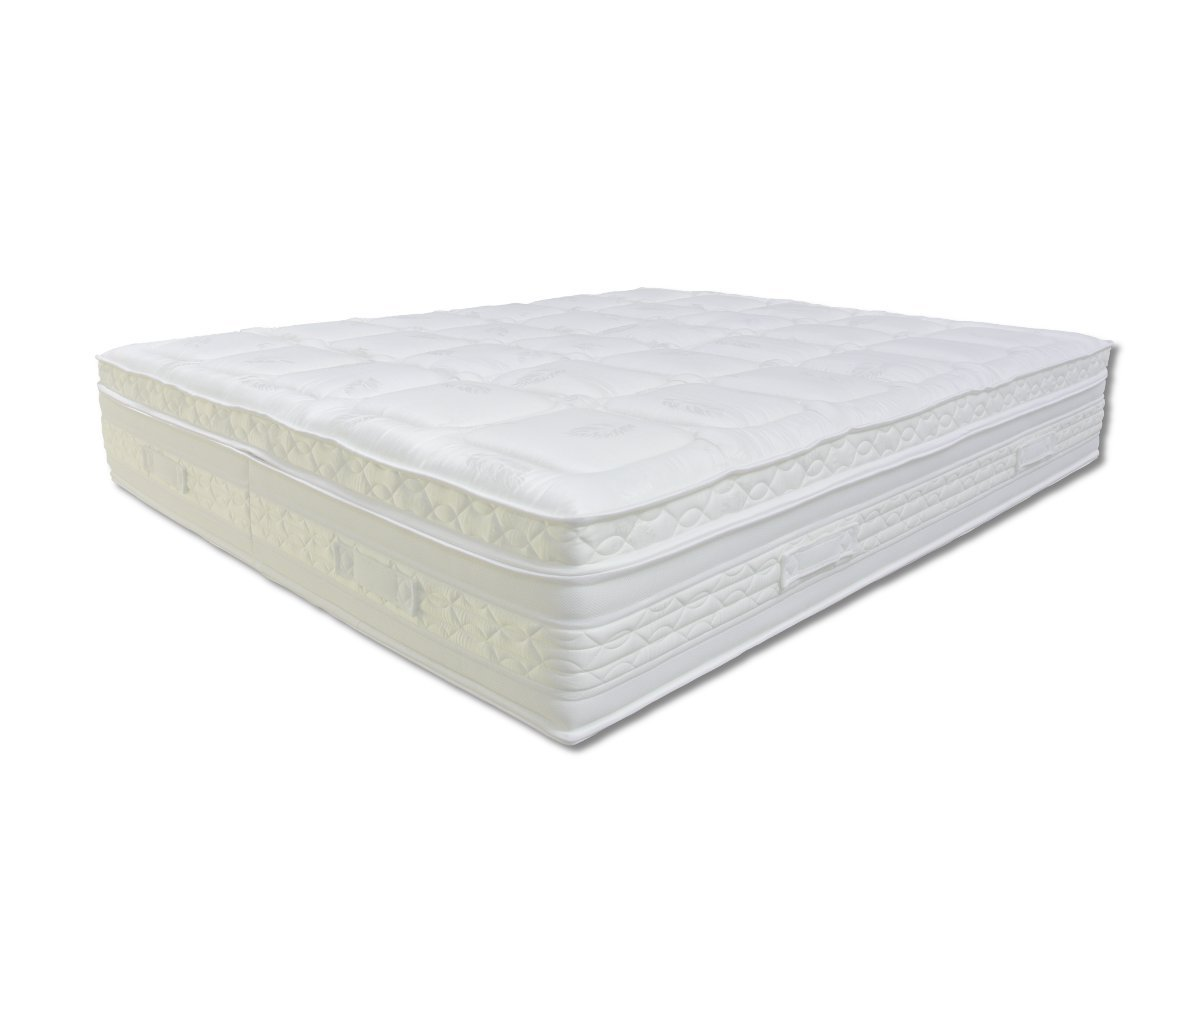 Baldiflex - colchón de Matrimonio de Seda Pluma 1600 resortes + Placas de Memory X CUS. Incluido Silver Safe: Amazon.es: Hogar